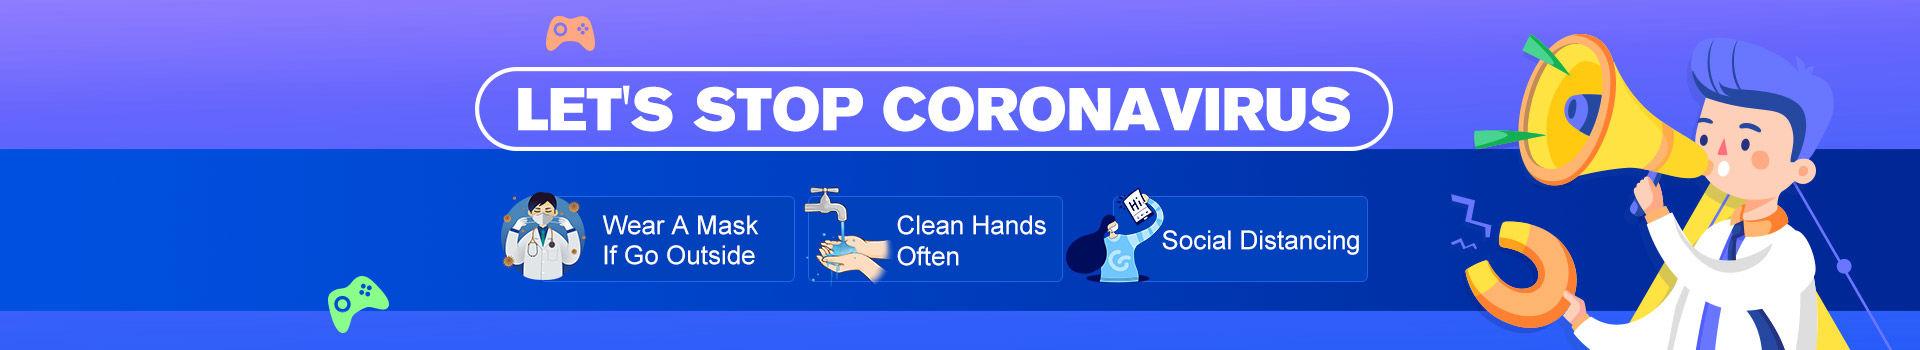 LET'S STOP CORONAVIRUS